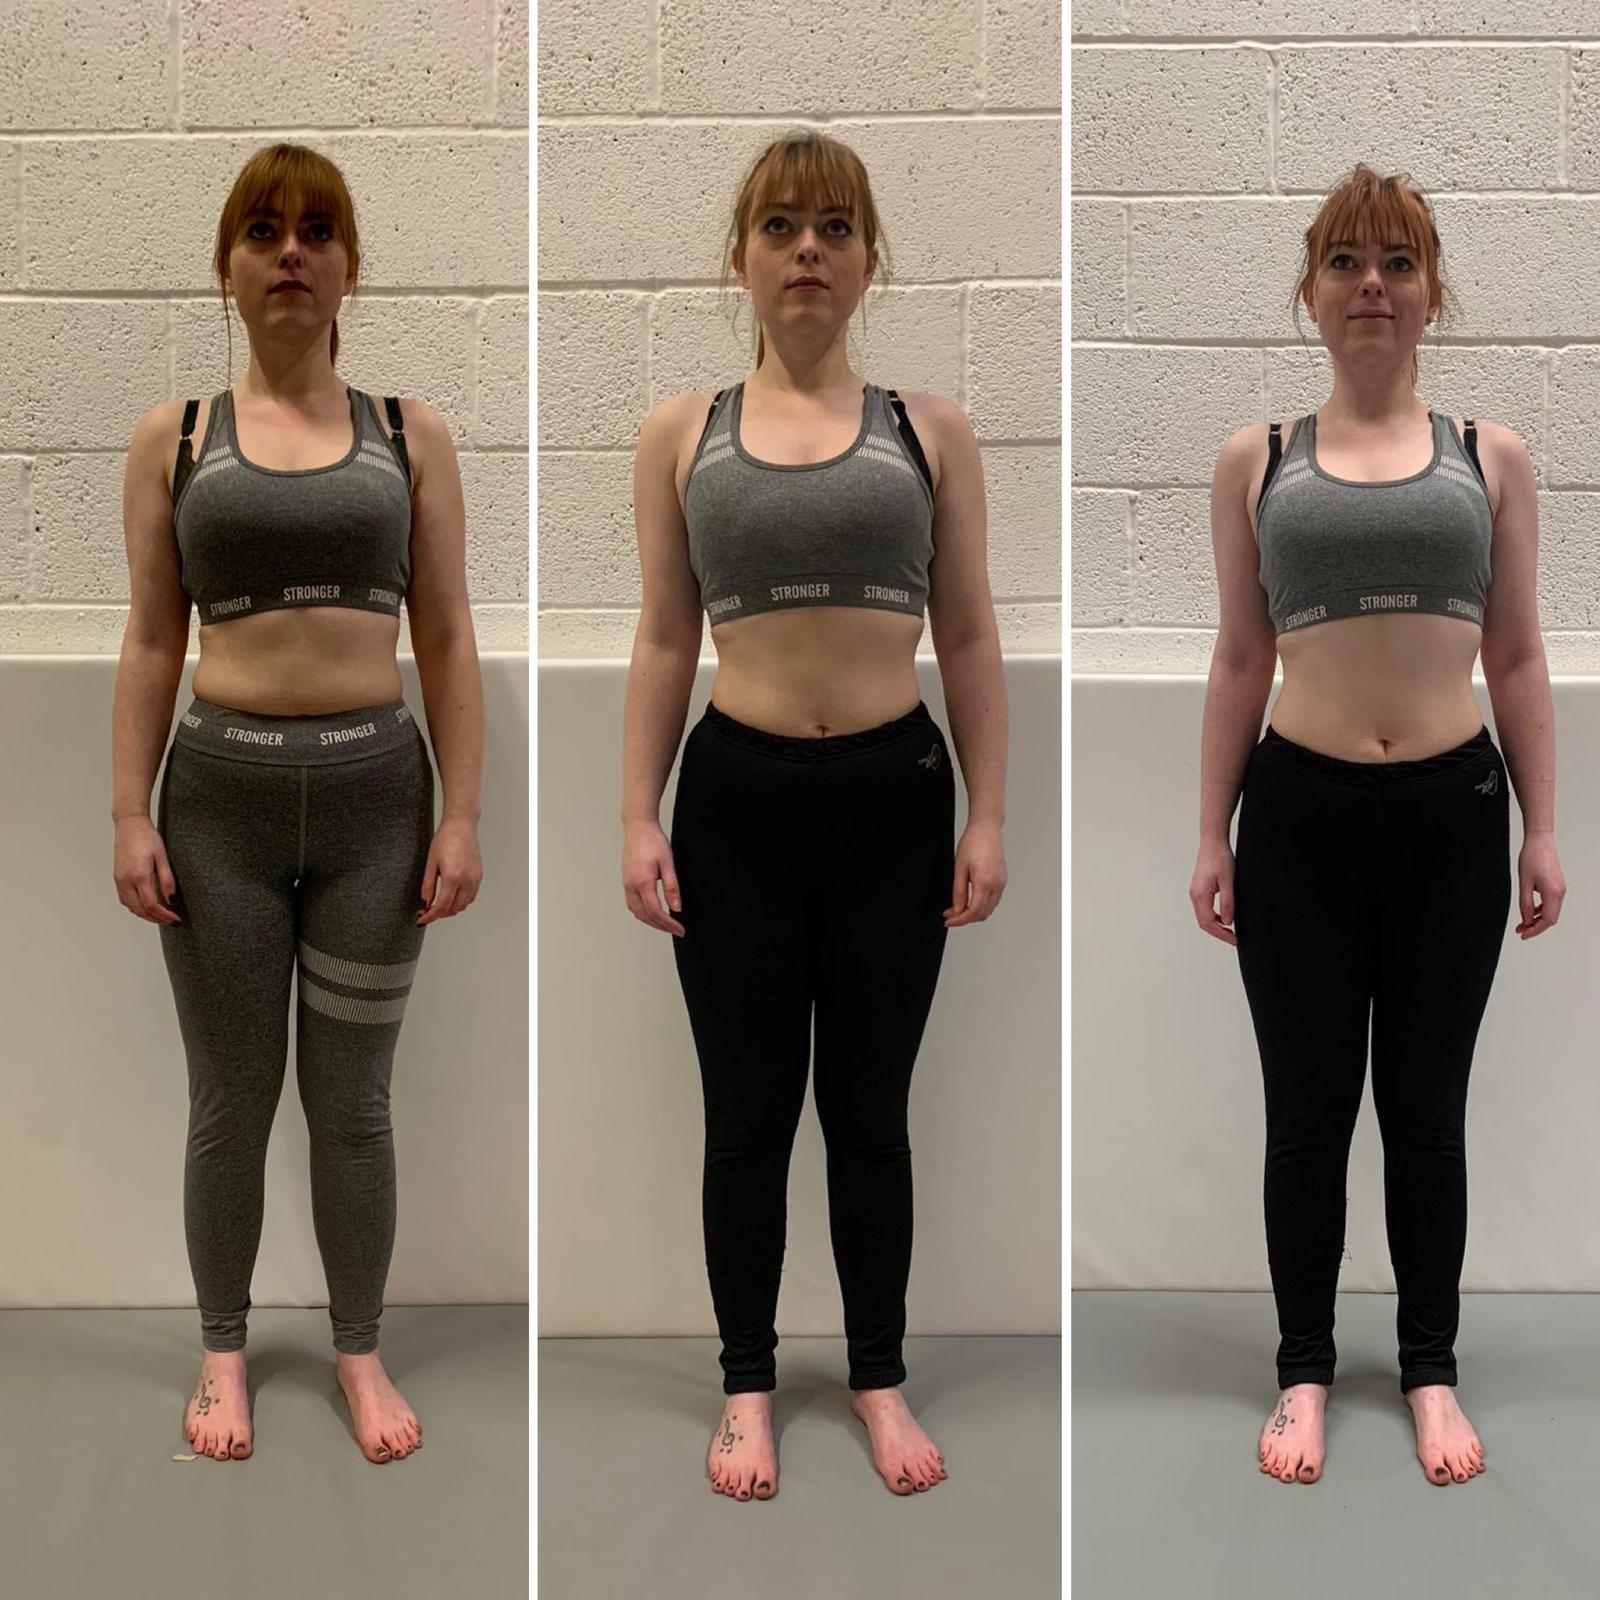 Sarah weight loss progress Primal Life Gym Lincoln 3